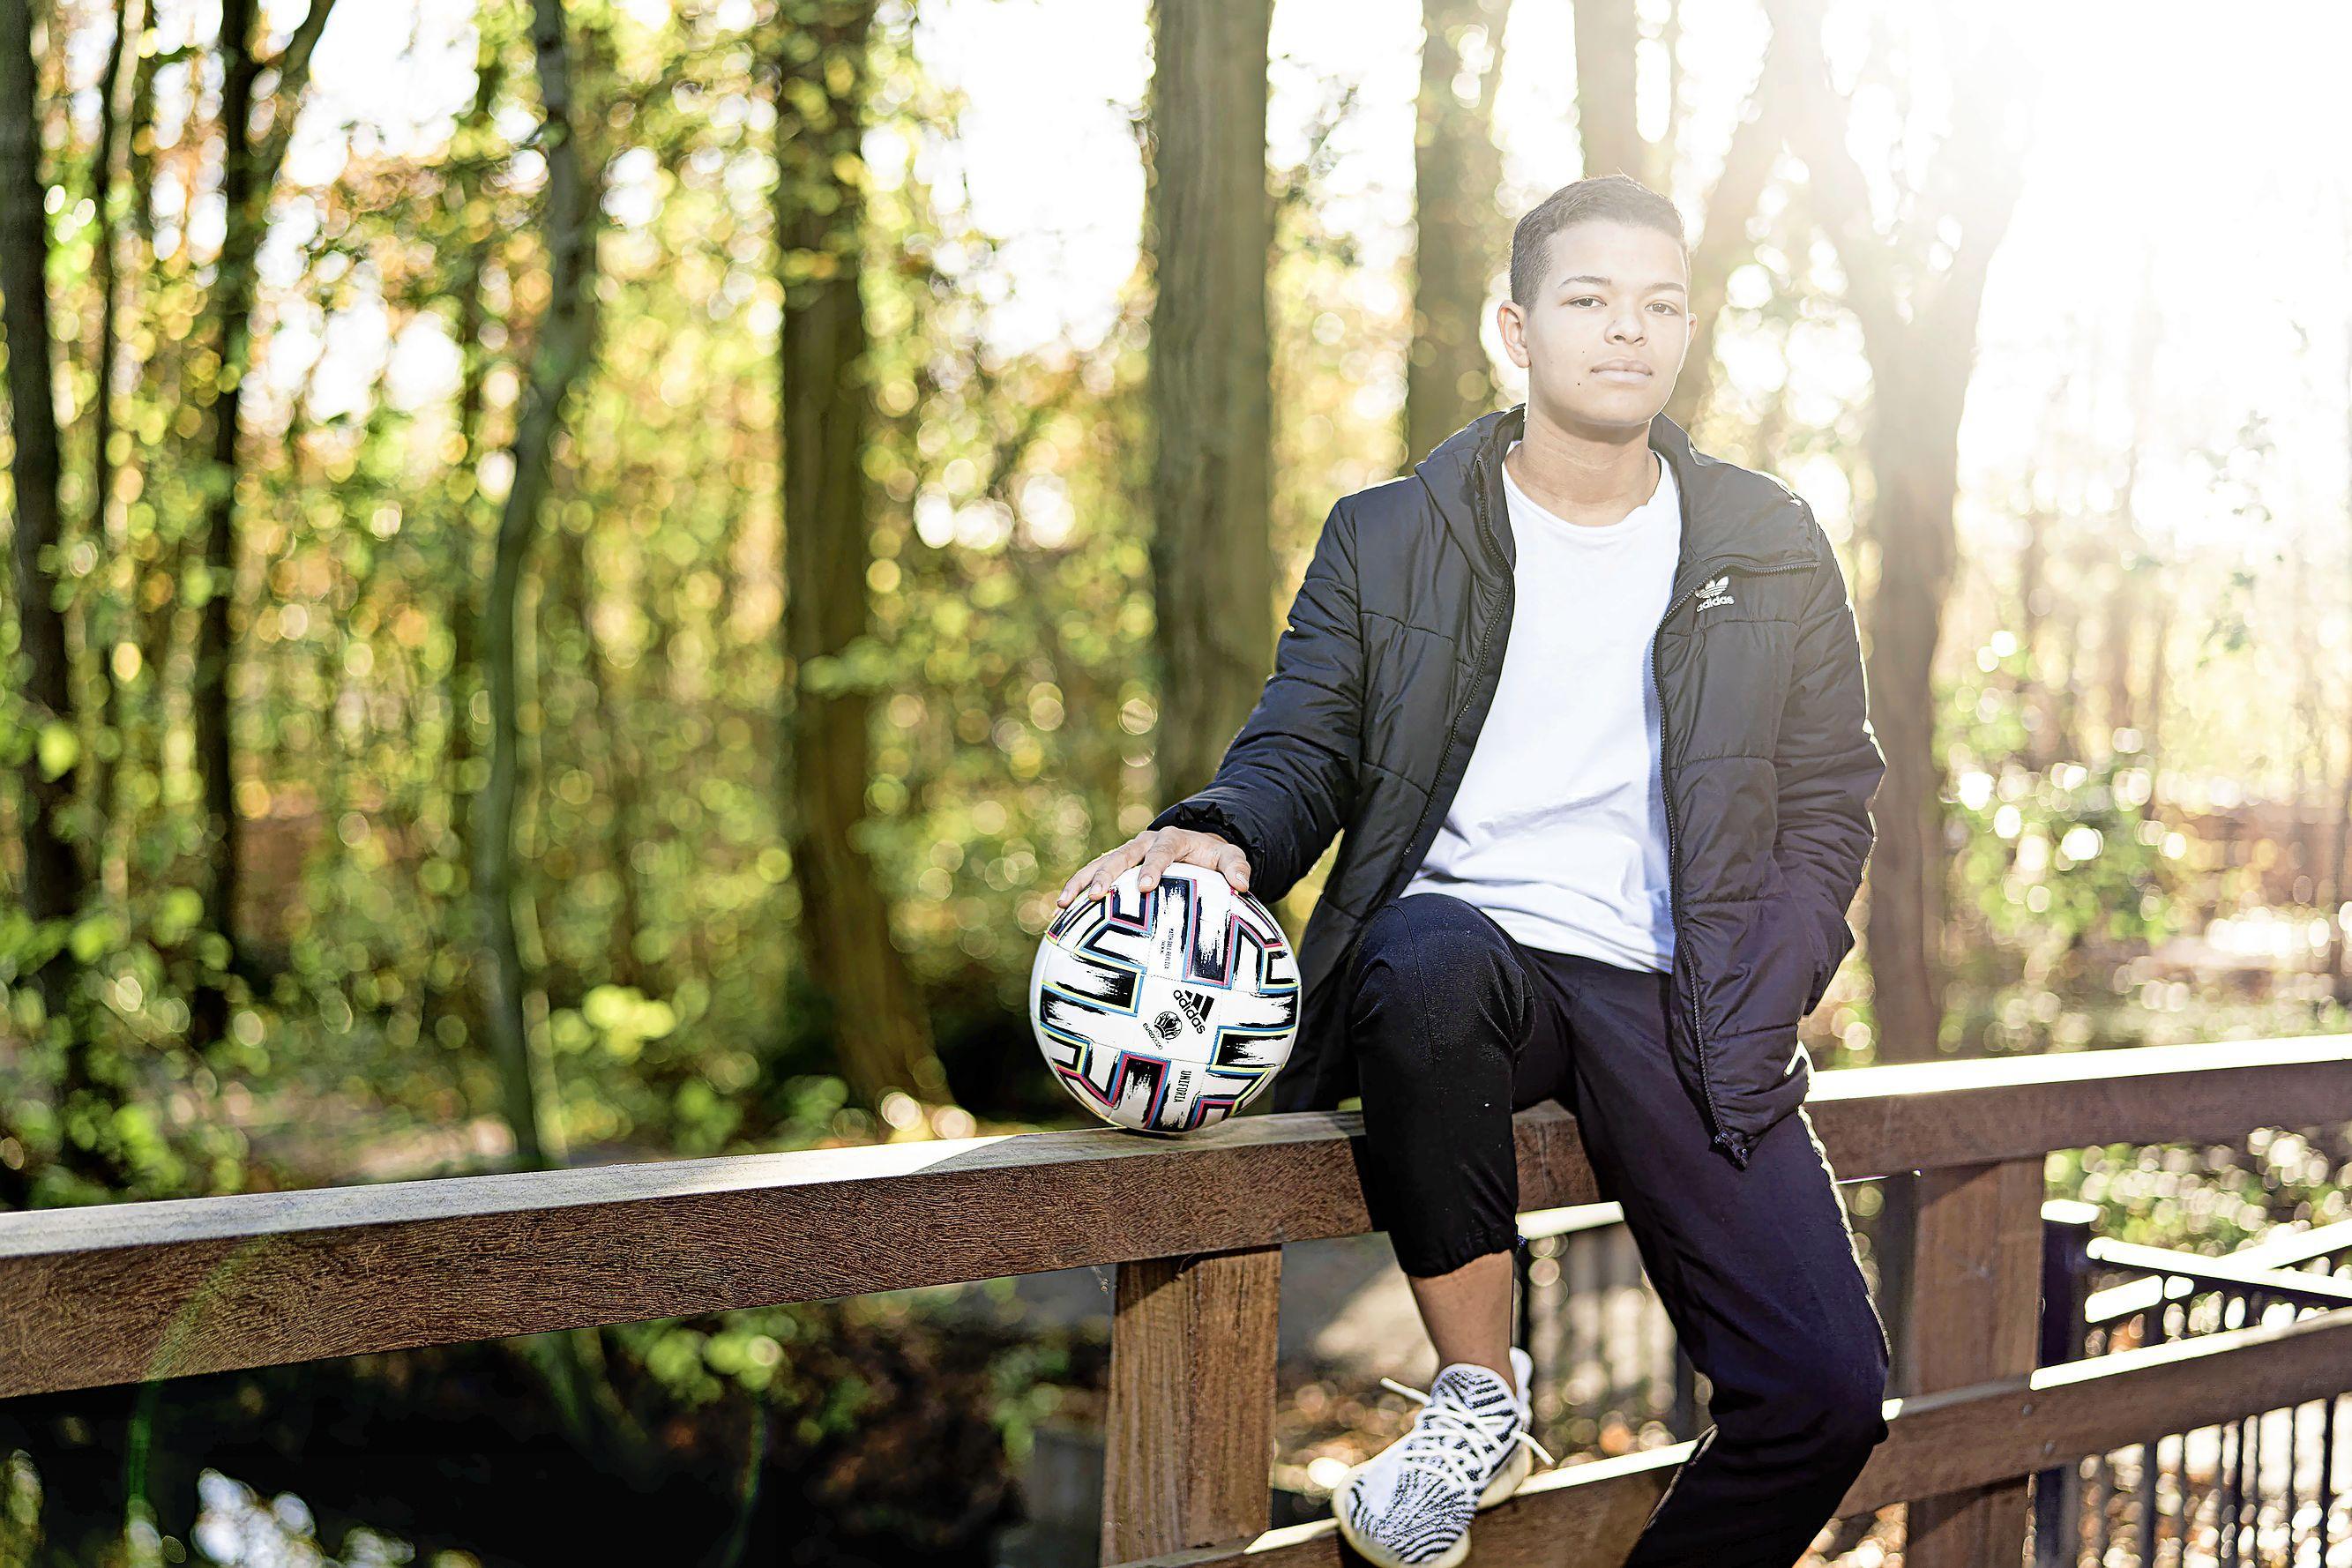 Leidse Samantha van Diemen maakt haar eerste doelpunt voor Ajax [video]